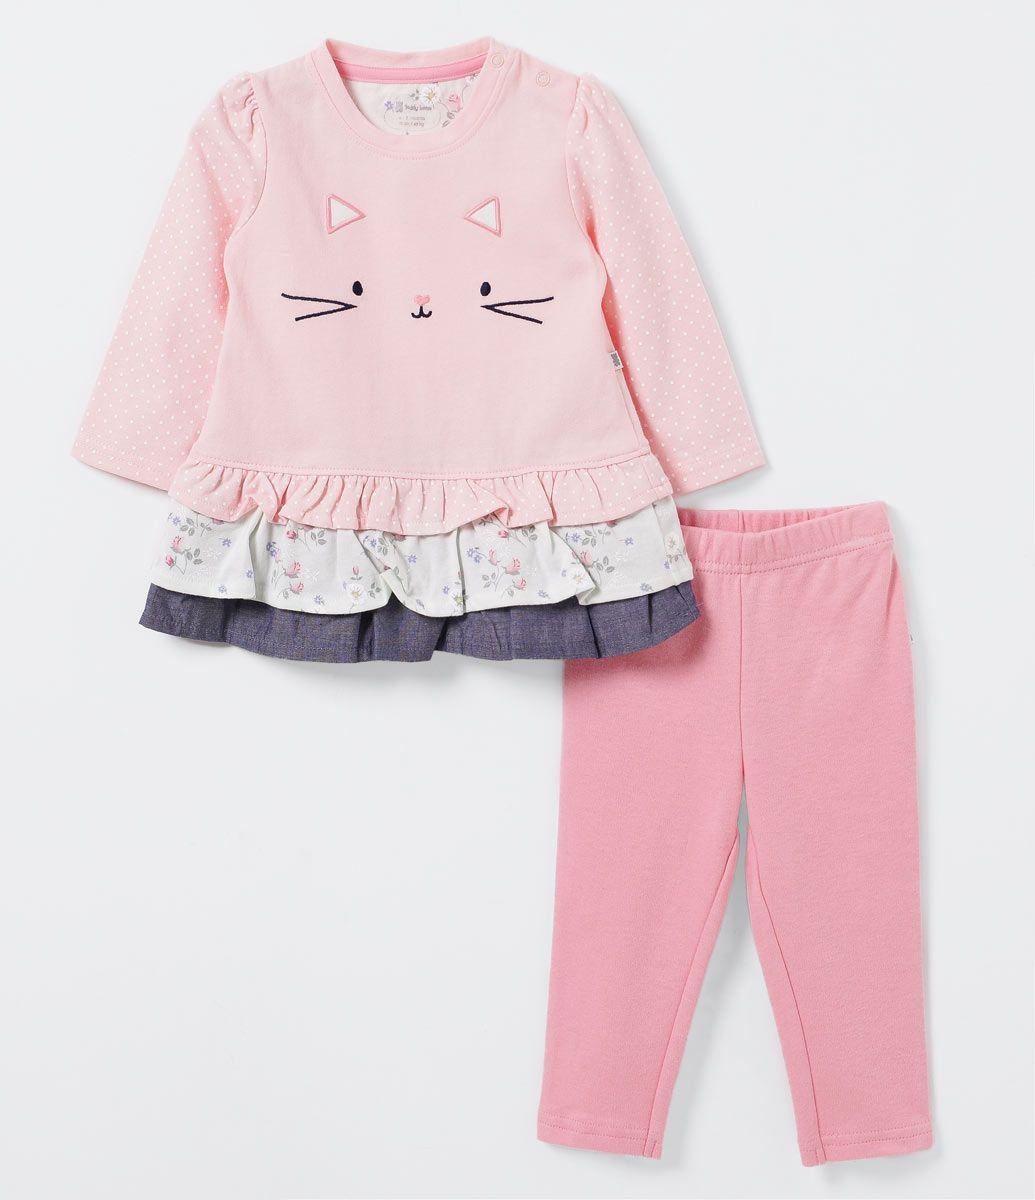 3D New Trend ENES-TOPRAK 2er Set Dress Baby T-Shirt Long Sleeve Sweatshirt und Hose im 3D Druck Design Fr/ühling Sommer M/ädchen Jungen bis Gr/ö/ße 80